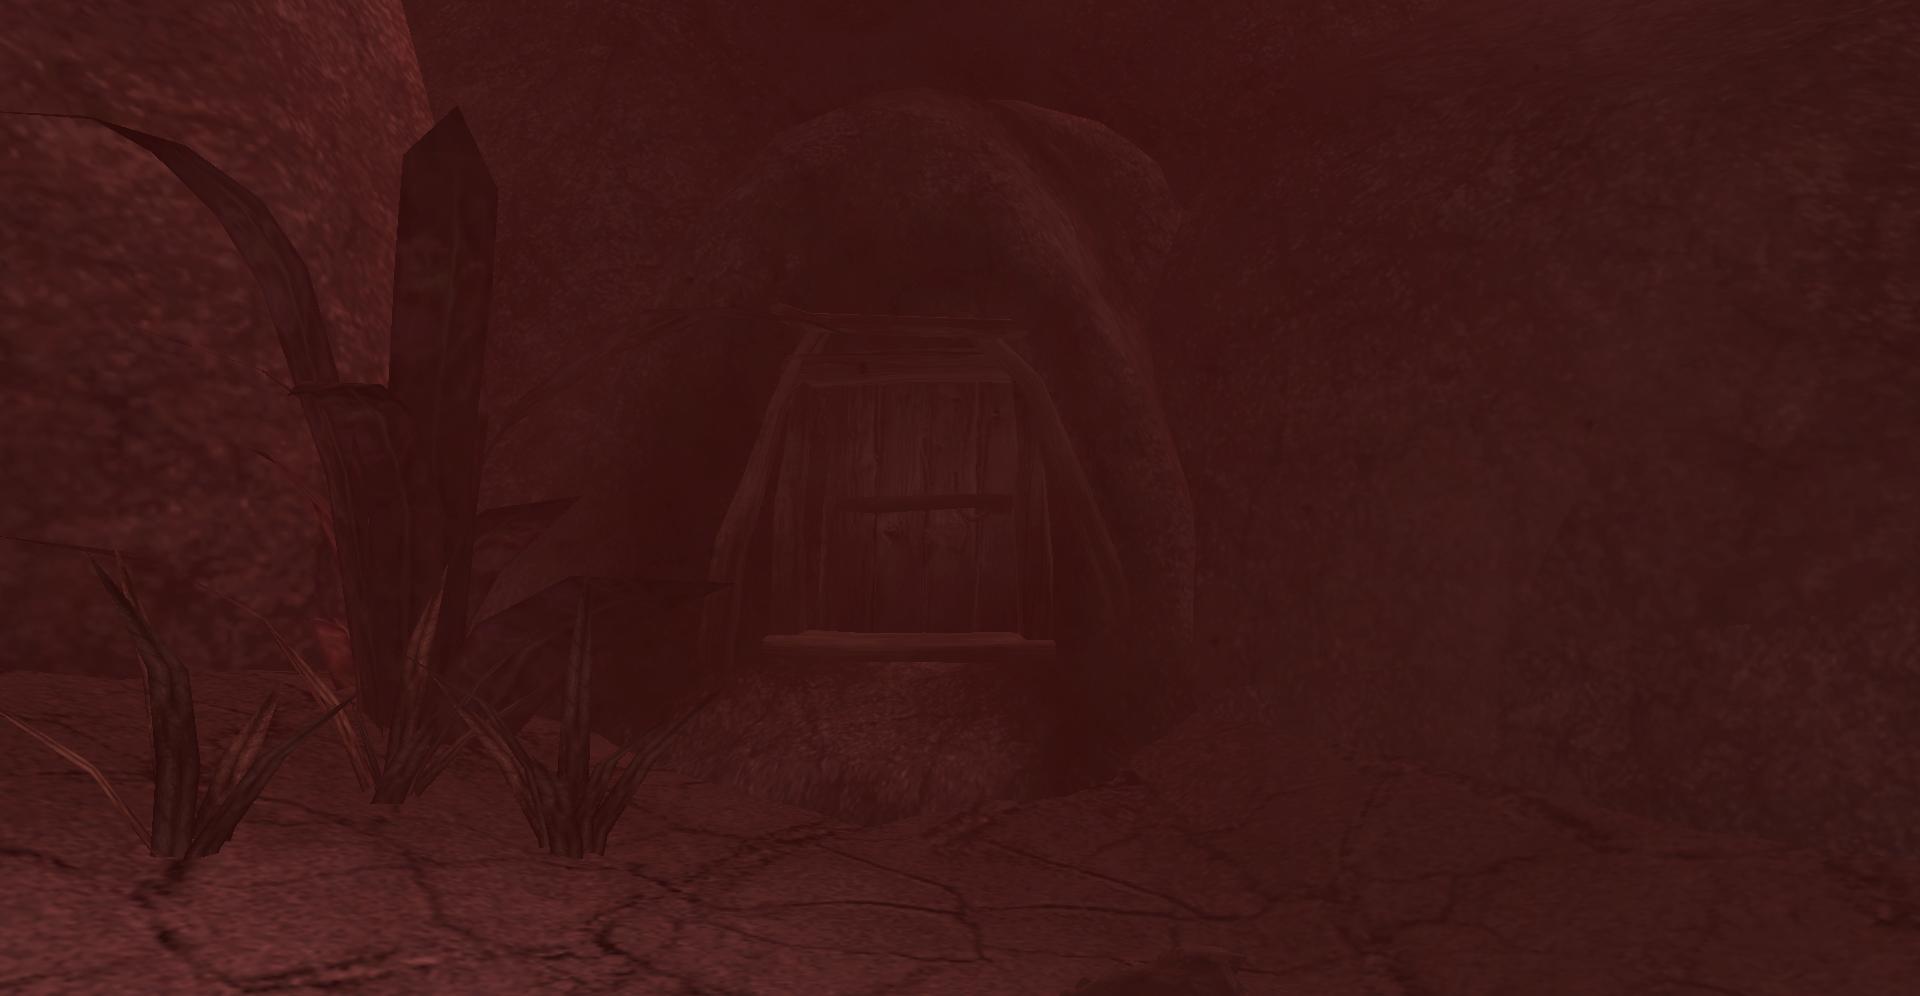 Mausur Caverns